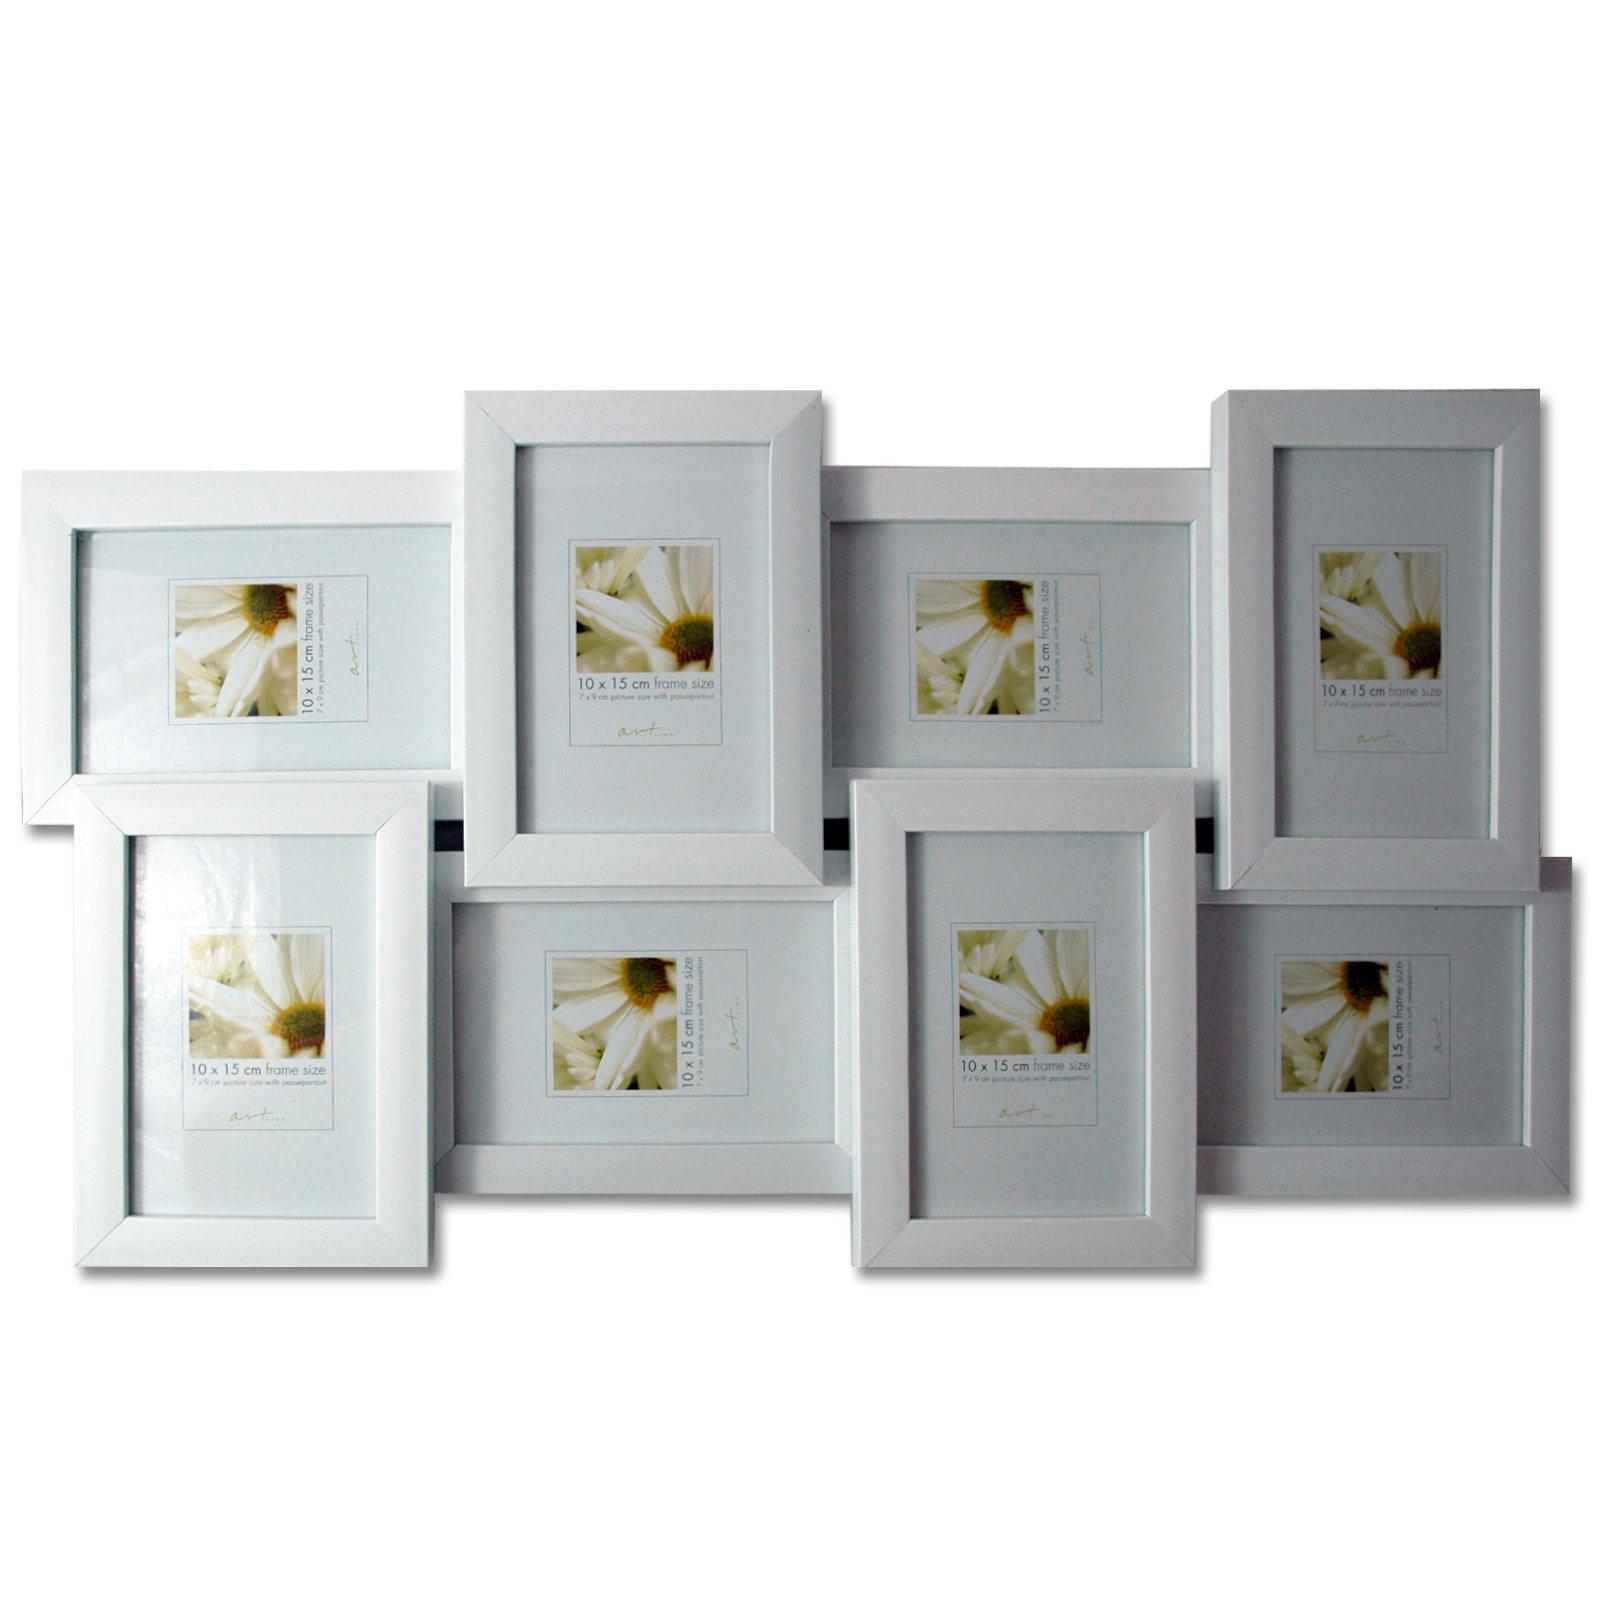 galerierahmen collagerahmen galerie rahmen mehrfach rahmen bilderrahmen holz ebay. Black Bedroom Furniture Sets. Home Design Ideas